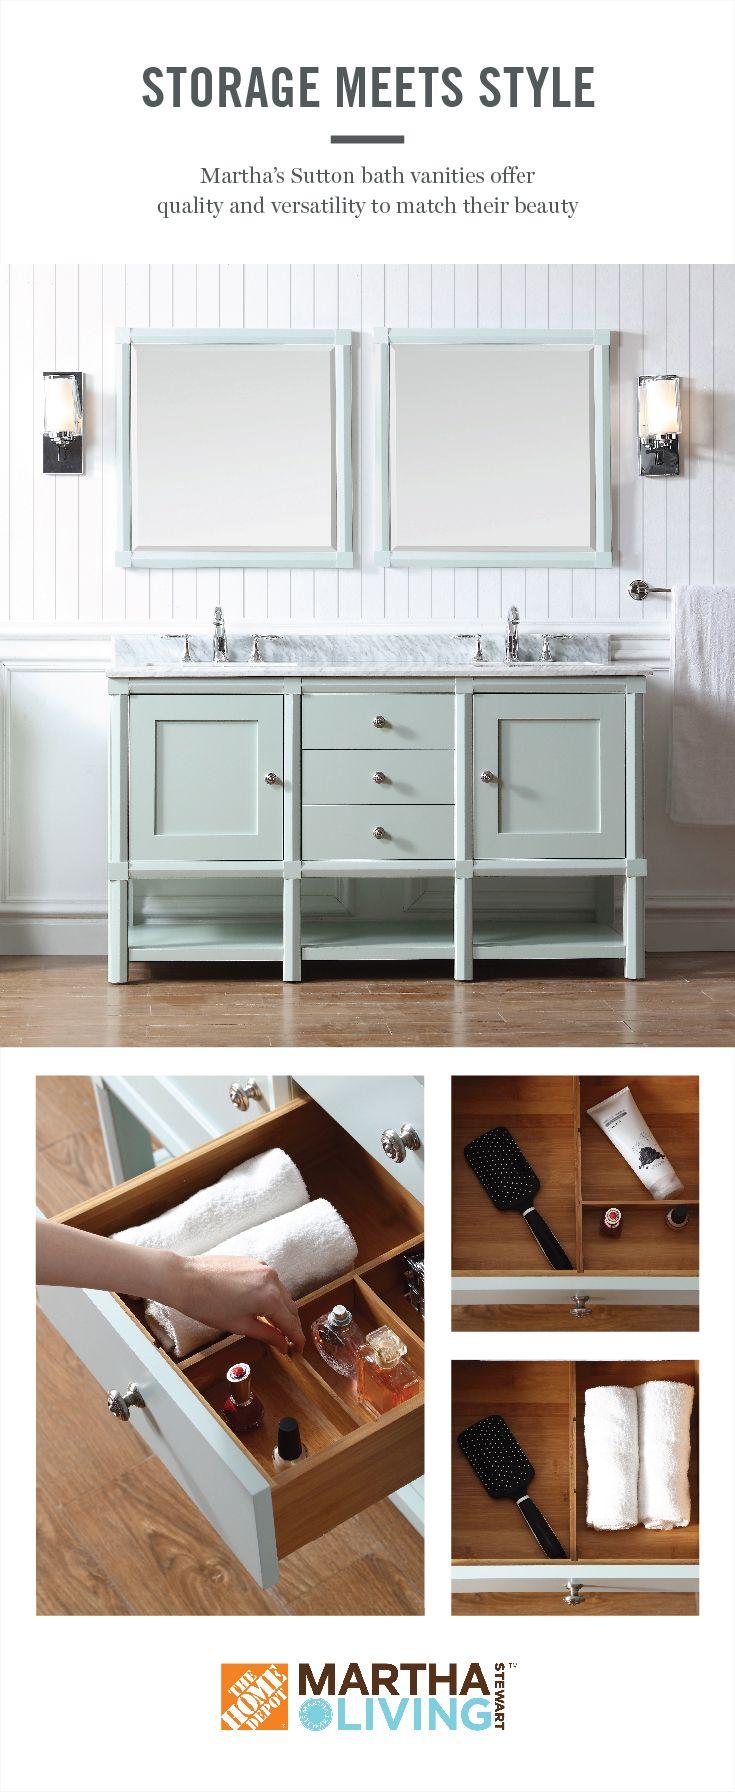 155 best Bathrooms images on Pinterest   Martha stewart  Bathroom ideas and  Bath vanities. 155 best Bathrooms images on Pinterest   Martha stewart  Bathroom